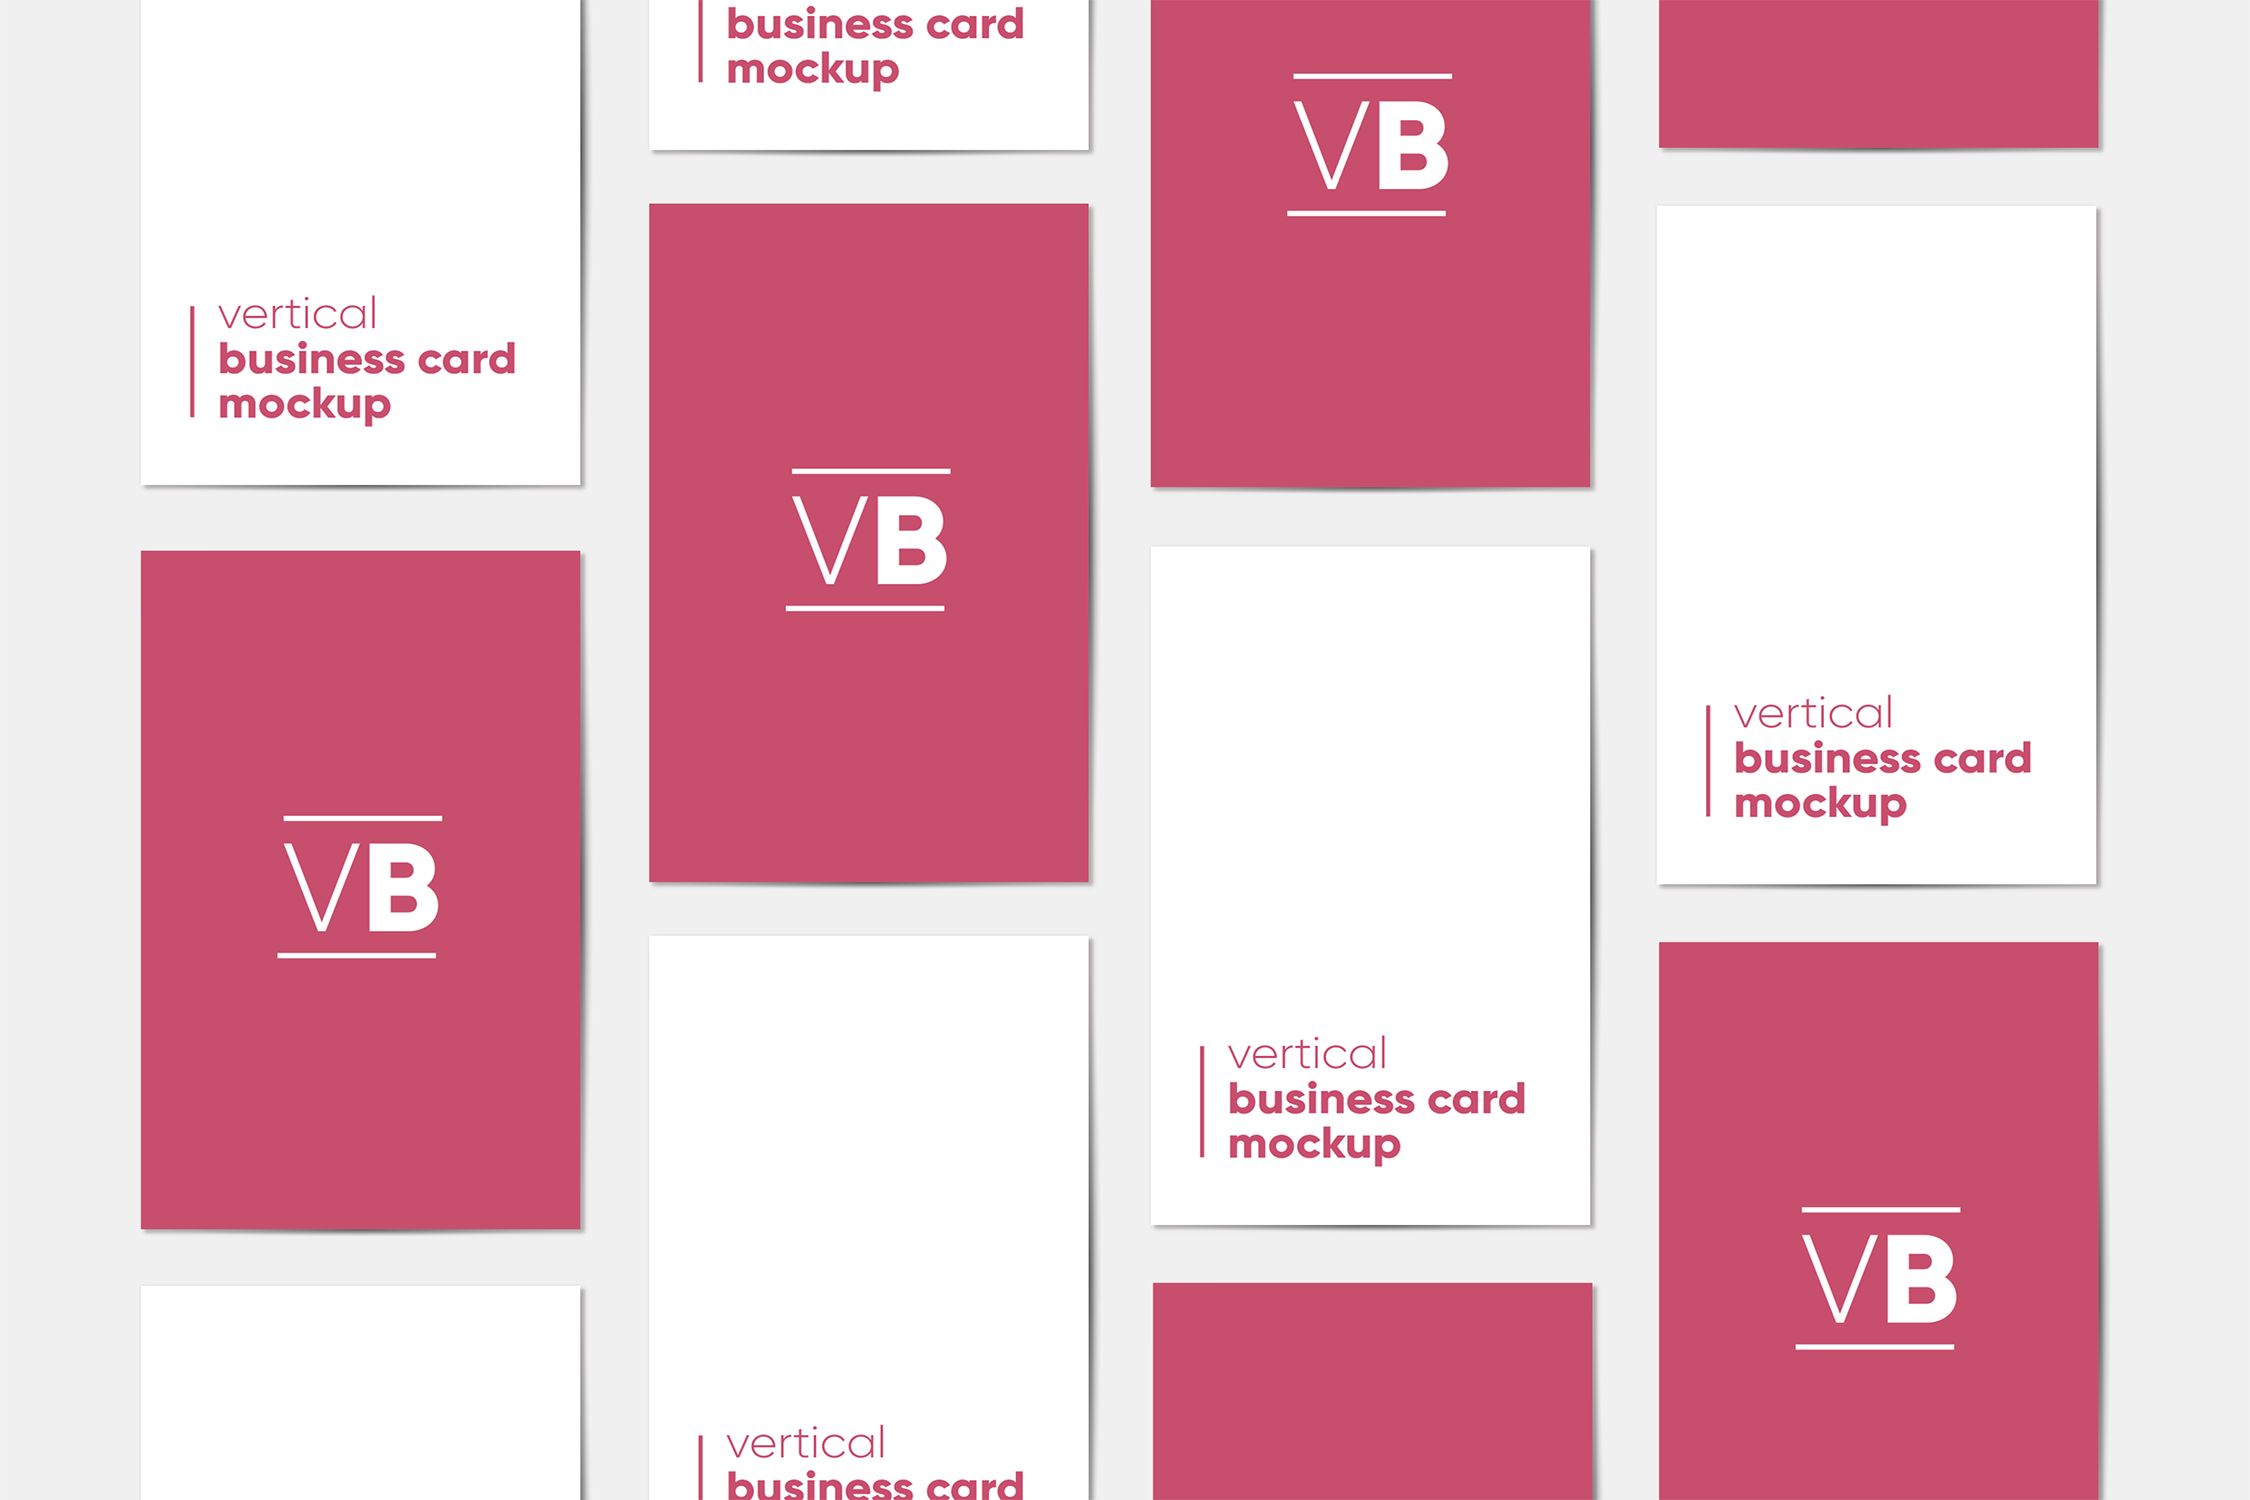 Vertical business card mockup by wildon design bundles vertical business card mockup example image 10 colourmoves